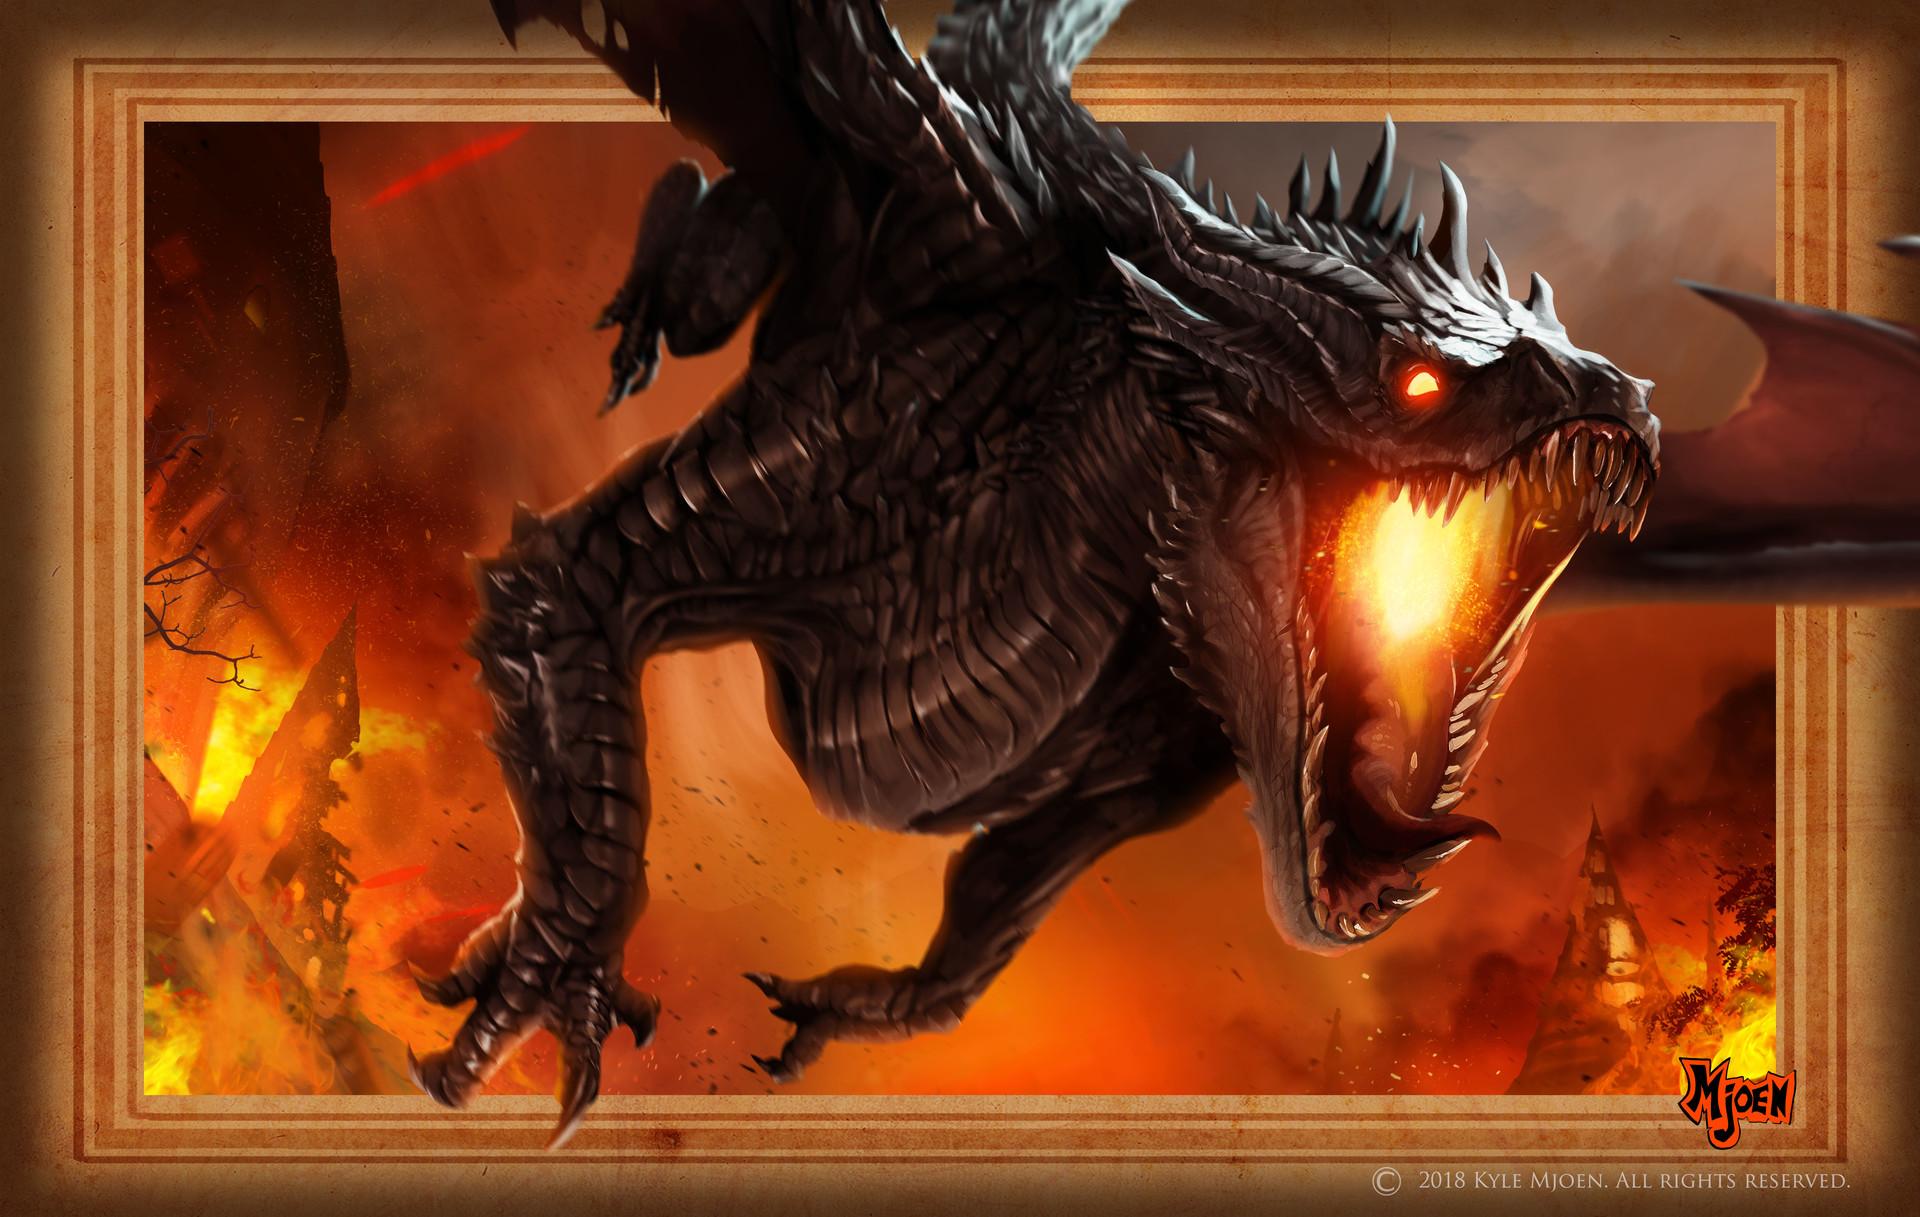 Kyle mjoen dragon inferno